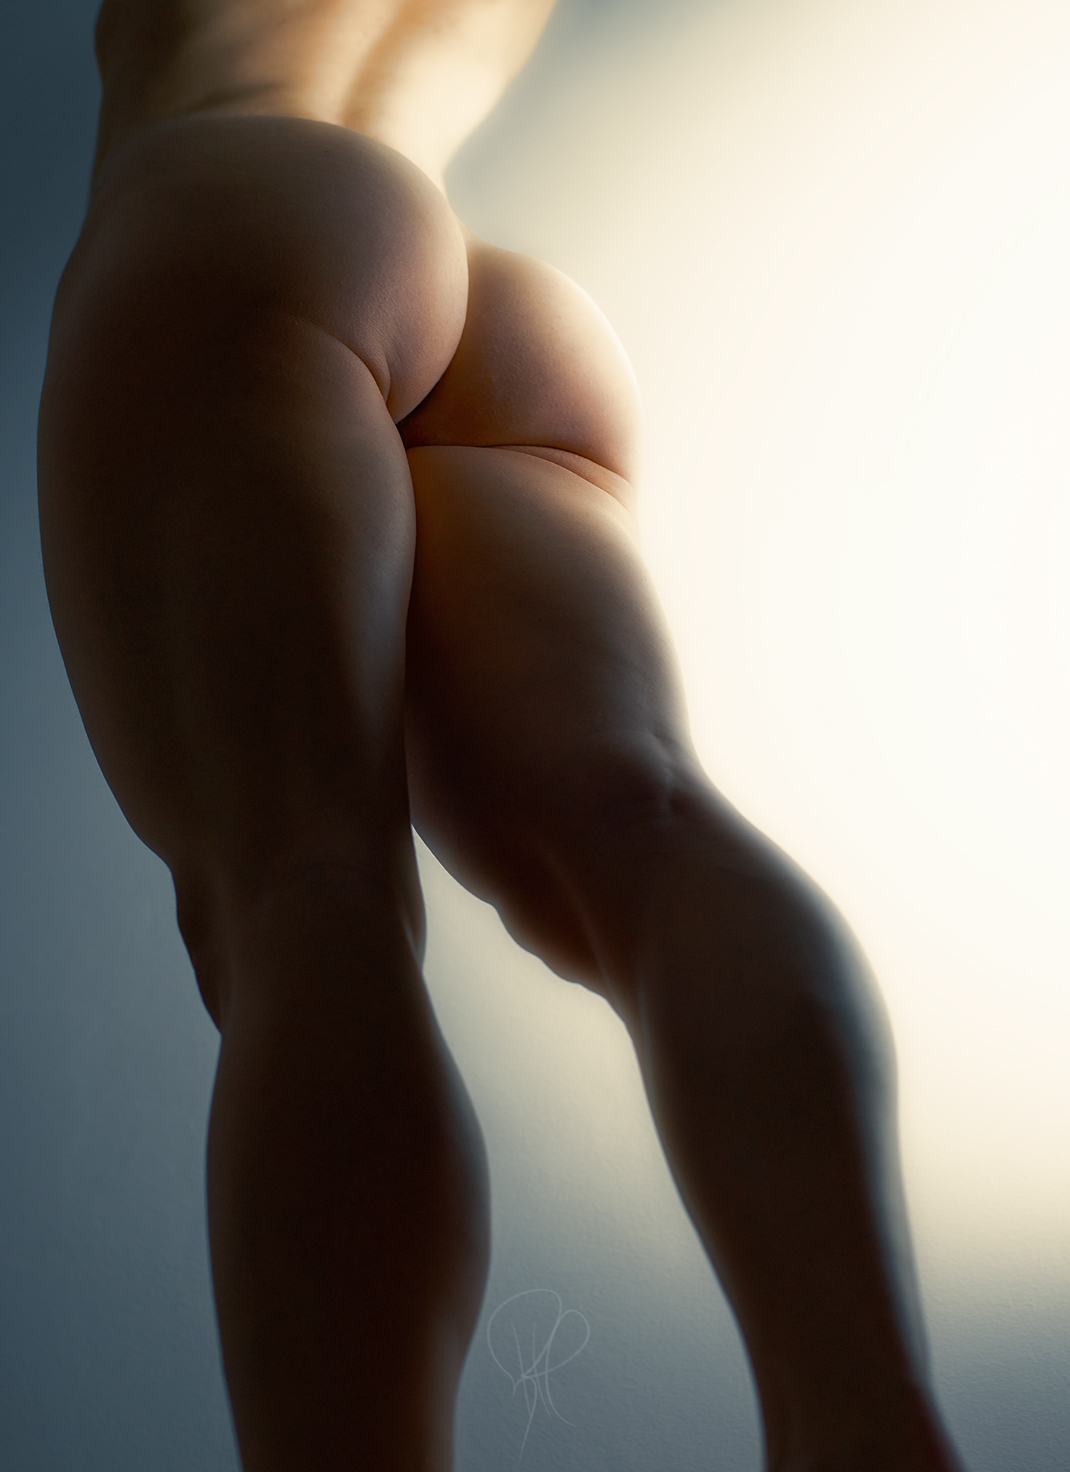 Thigh gap nude video-9368